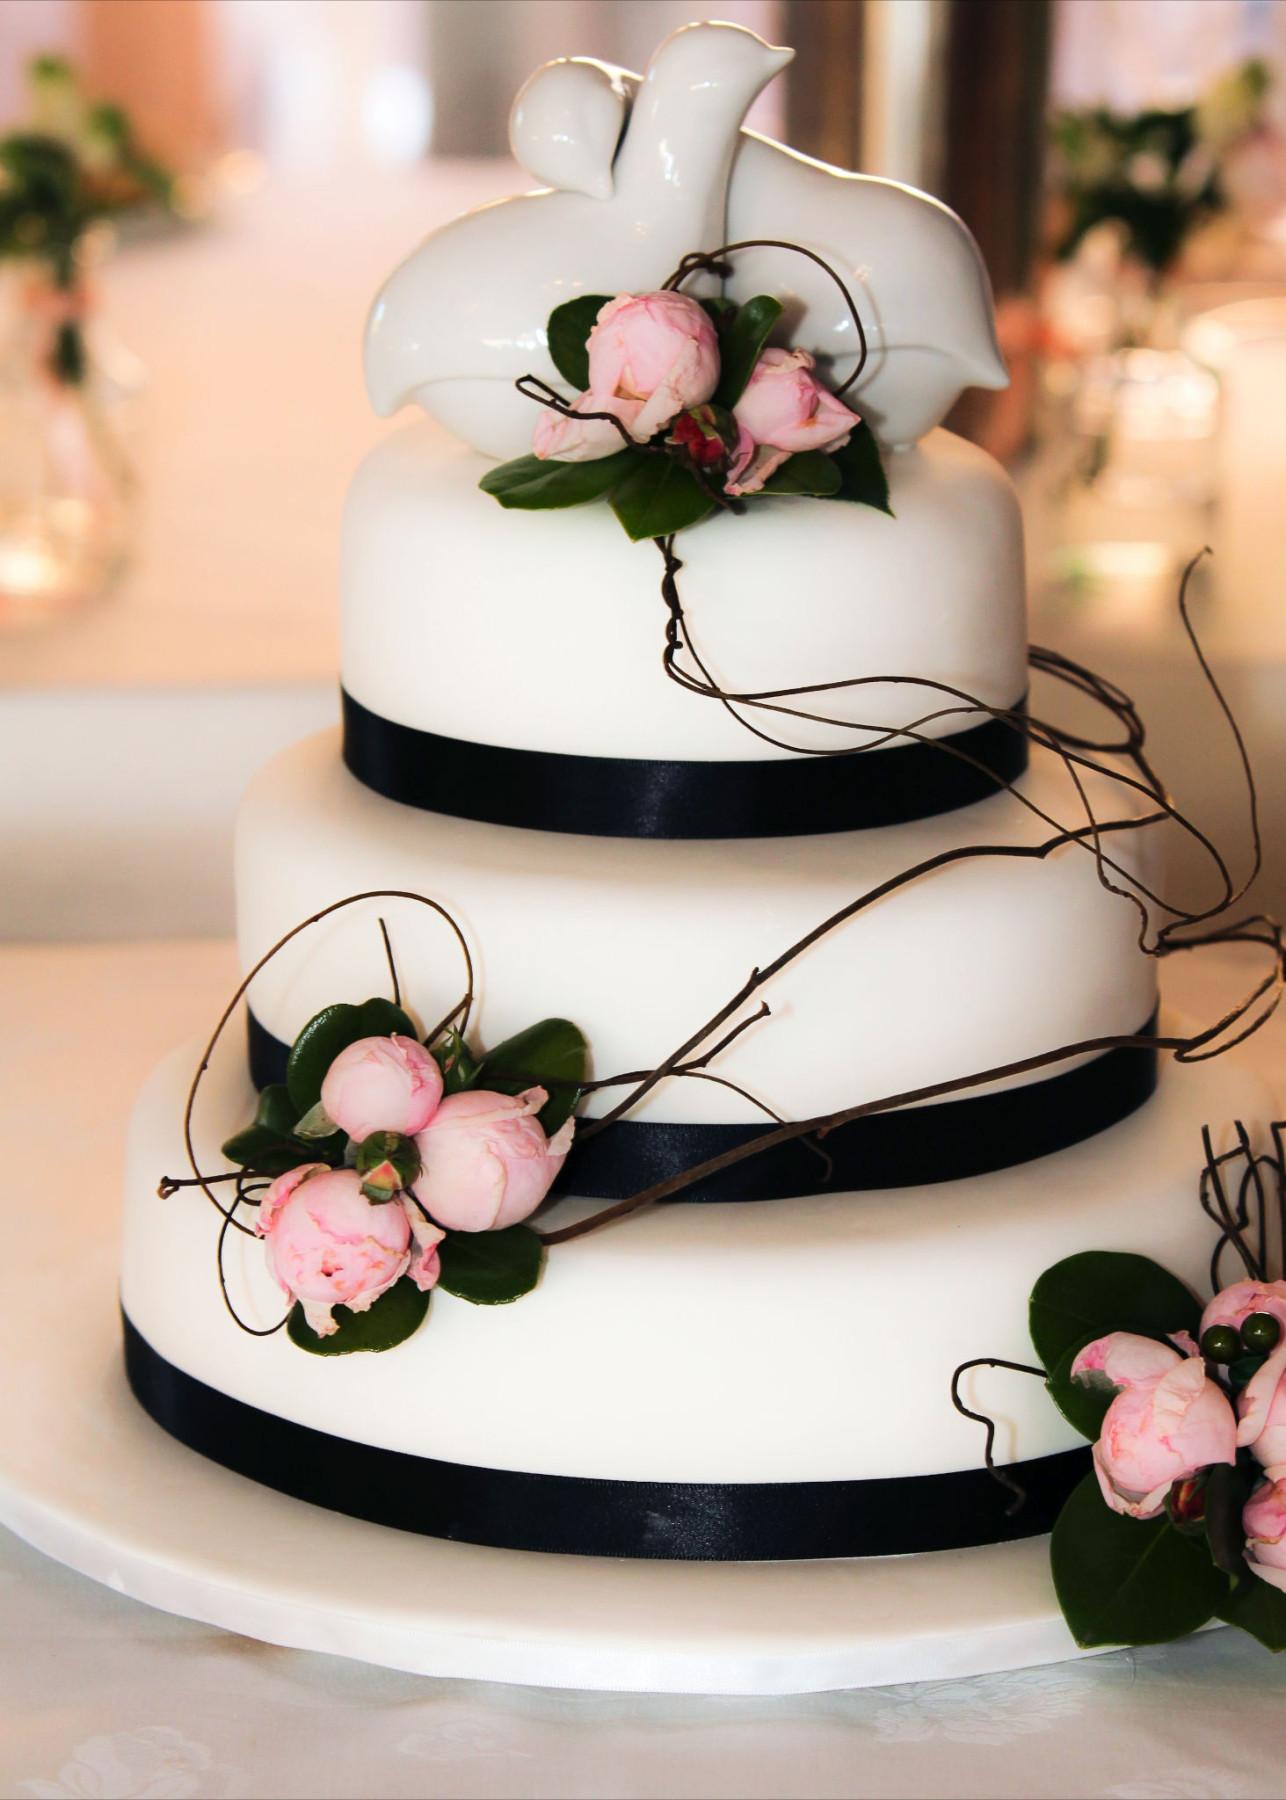 david austin rose three tier cake design